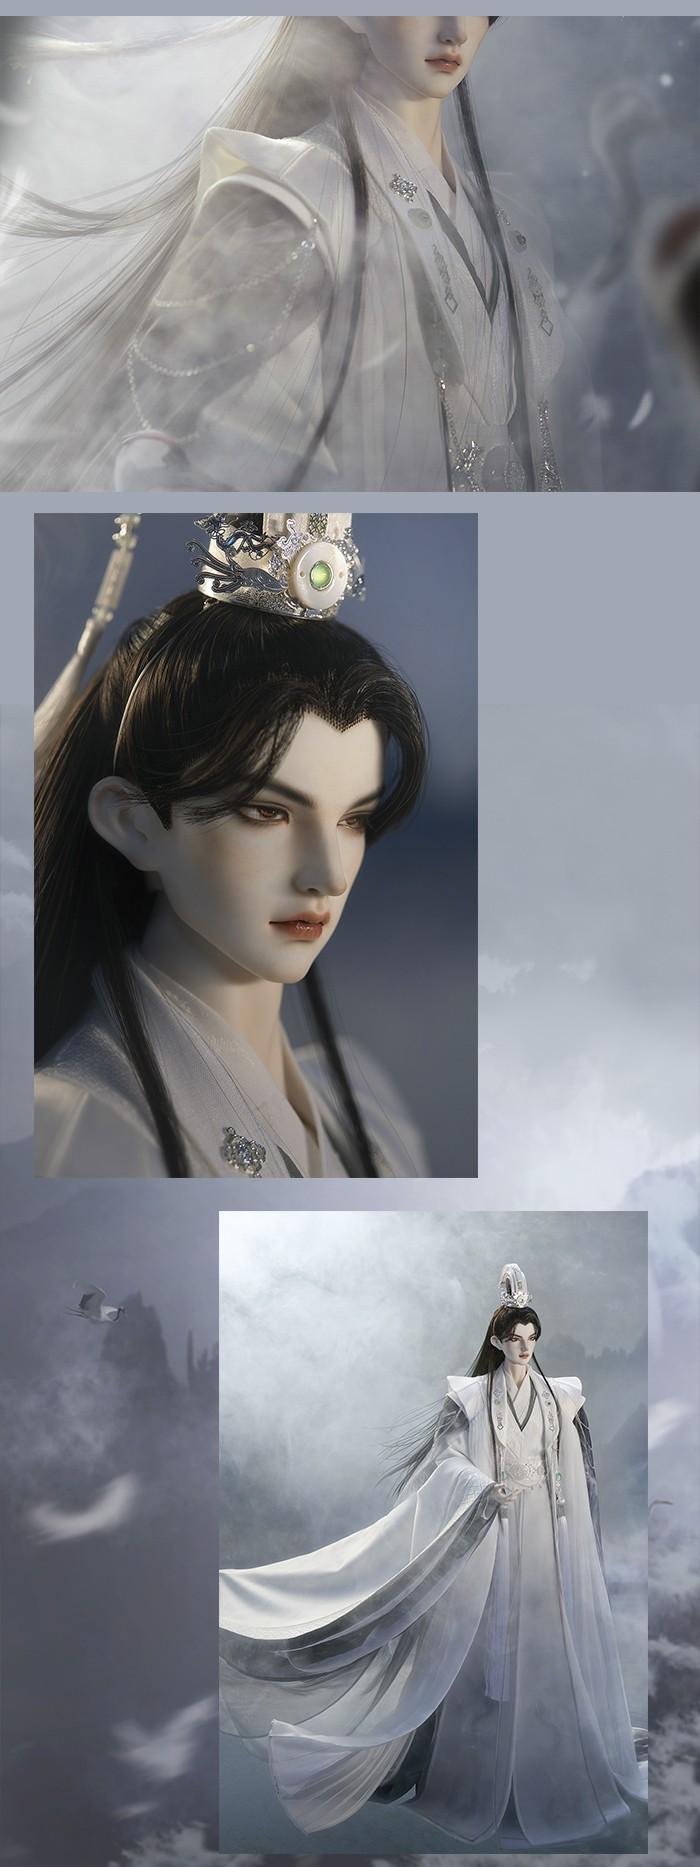 ls_yingzhou_07.jpg